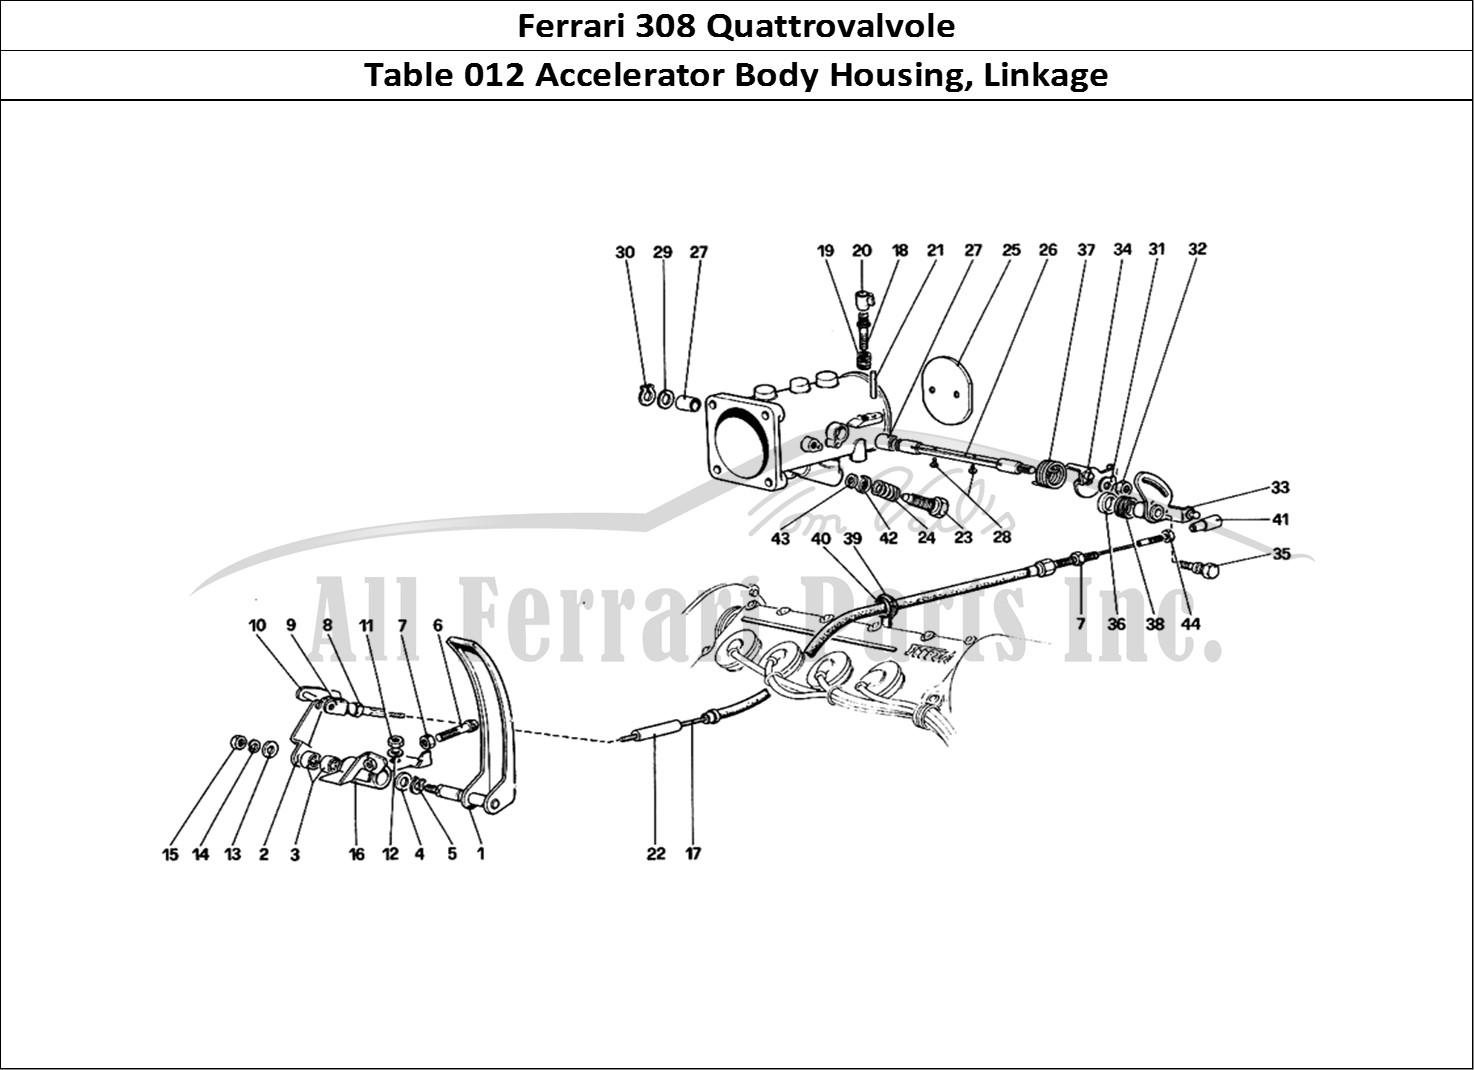 Buy Original Ferrari 308 Quattrovalvole 012 Accelerator